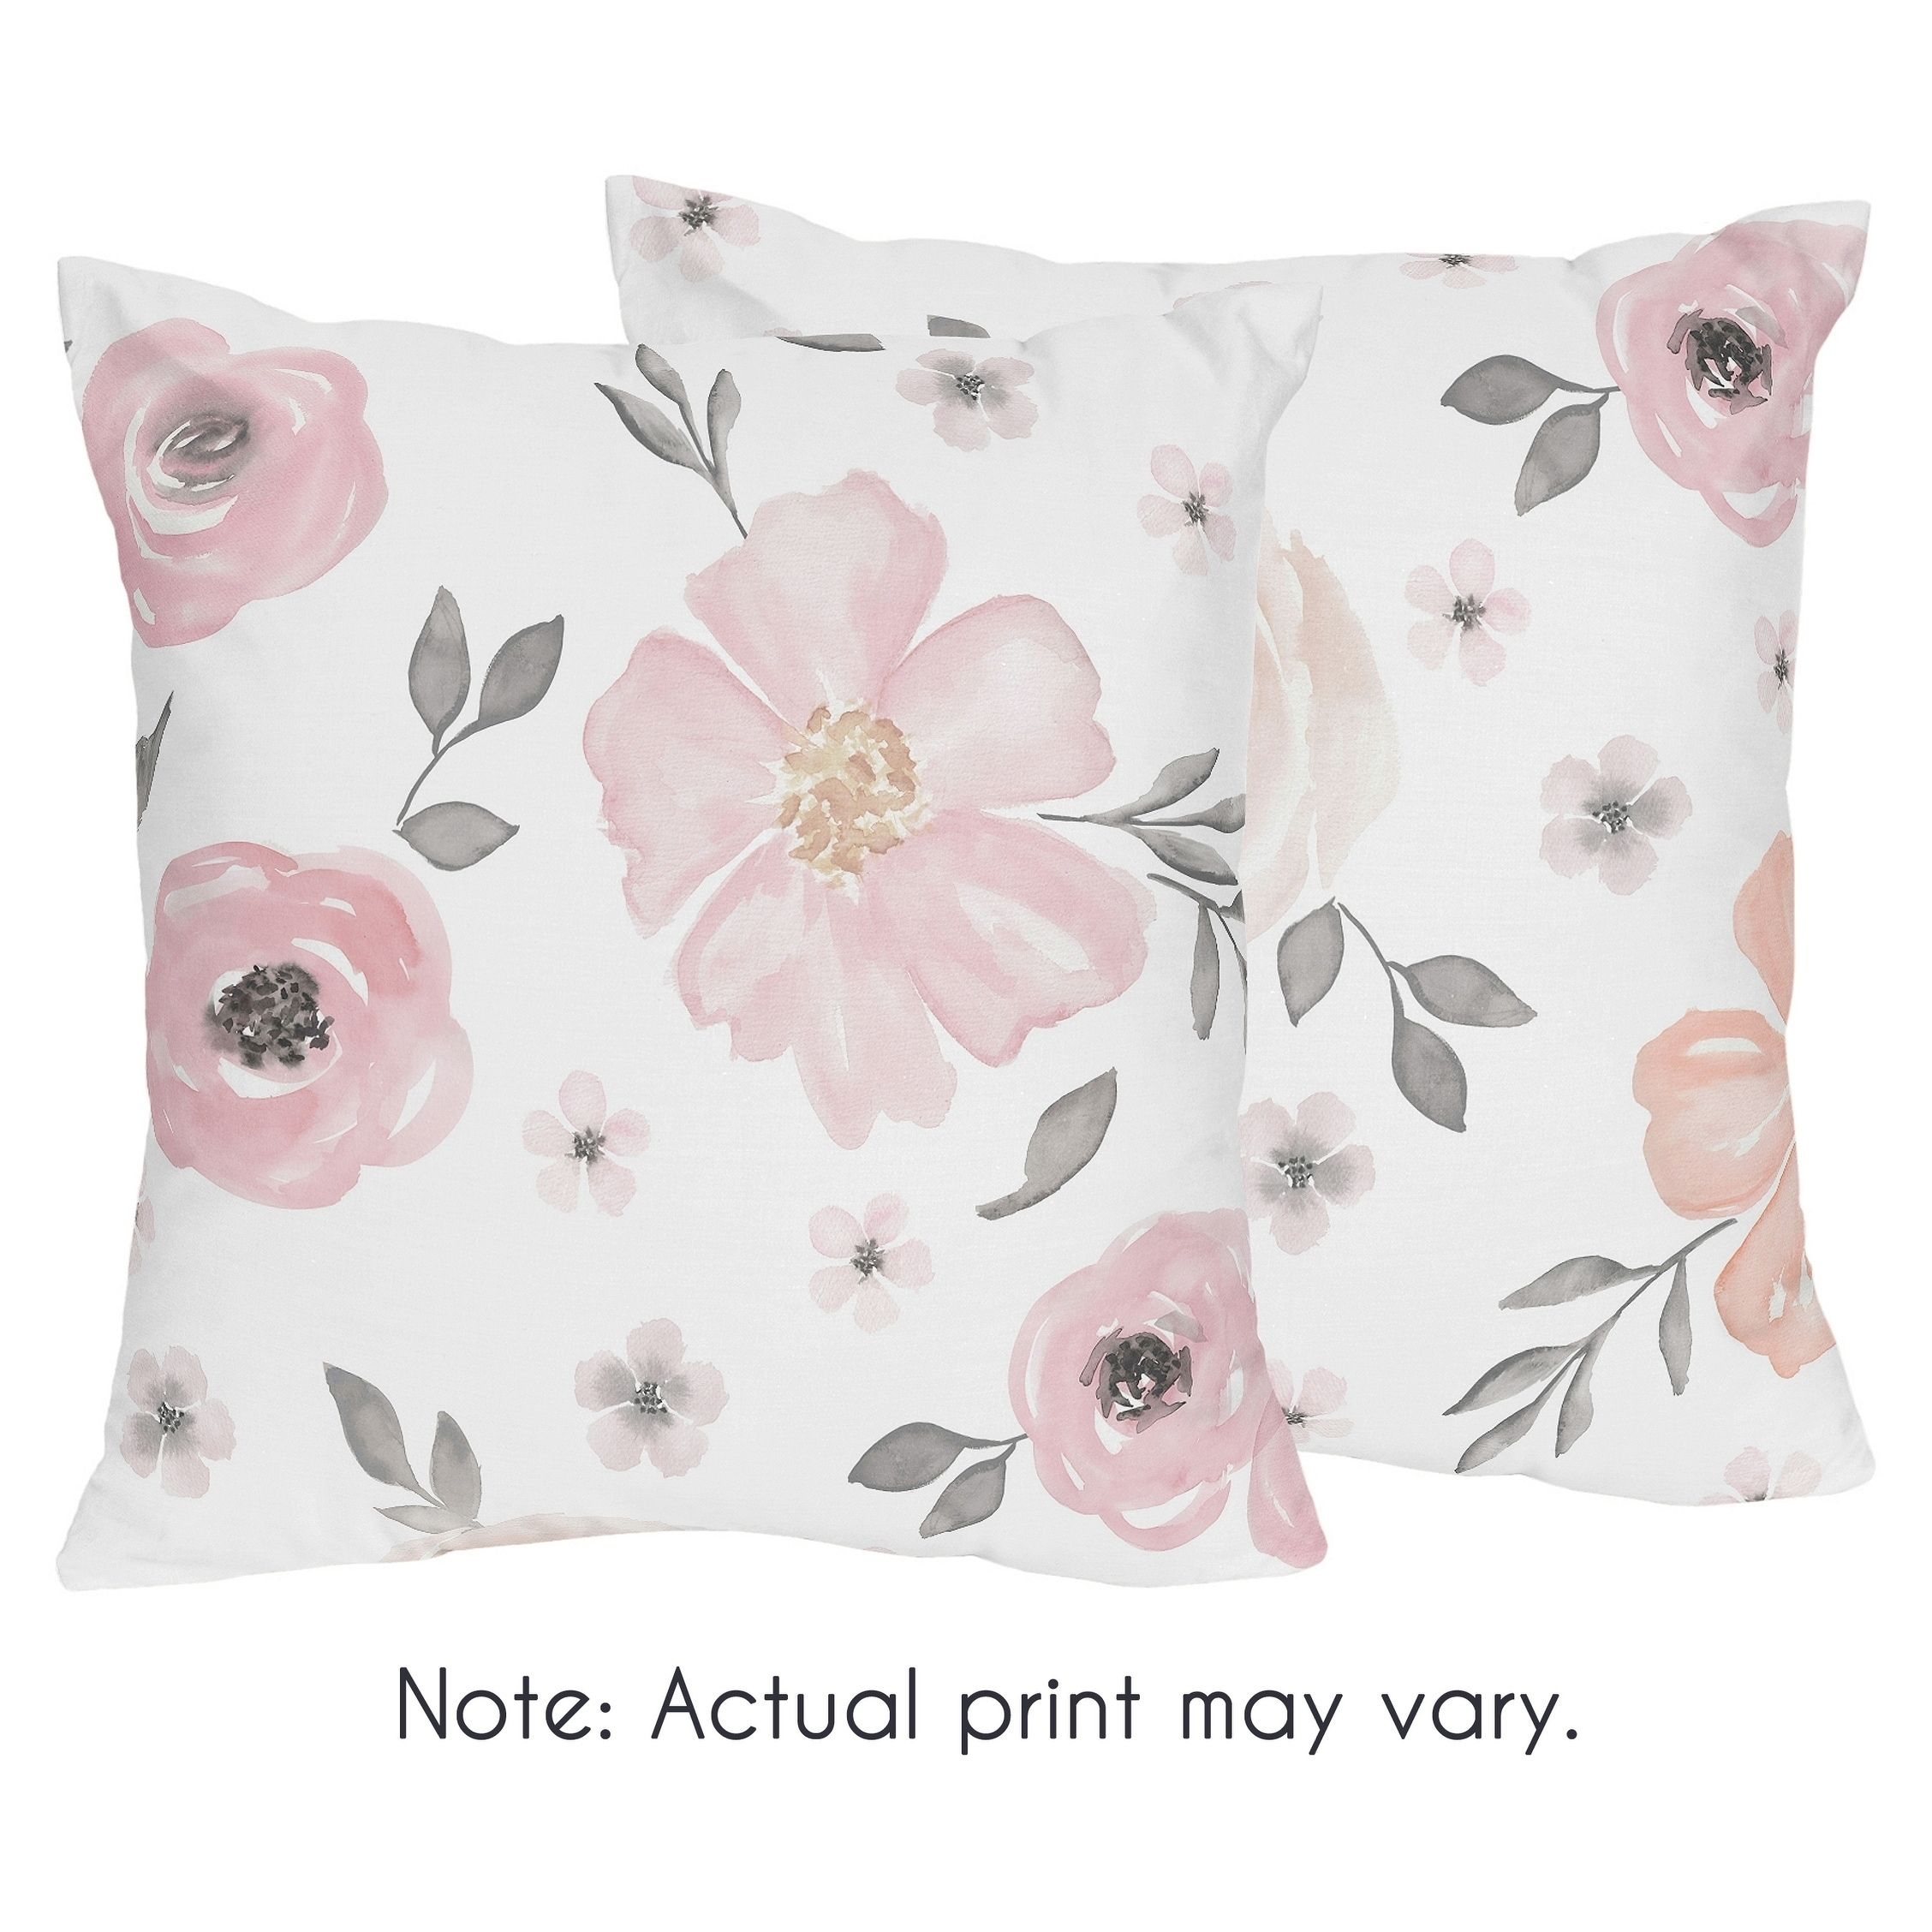 Baby Pink Watercolor Paisley 2 Pillow